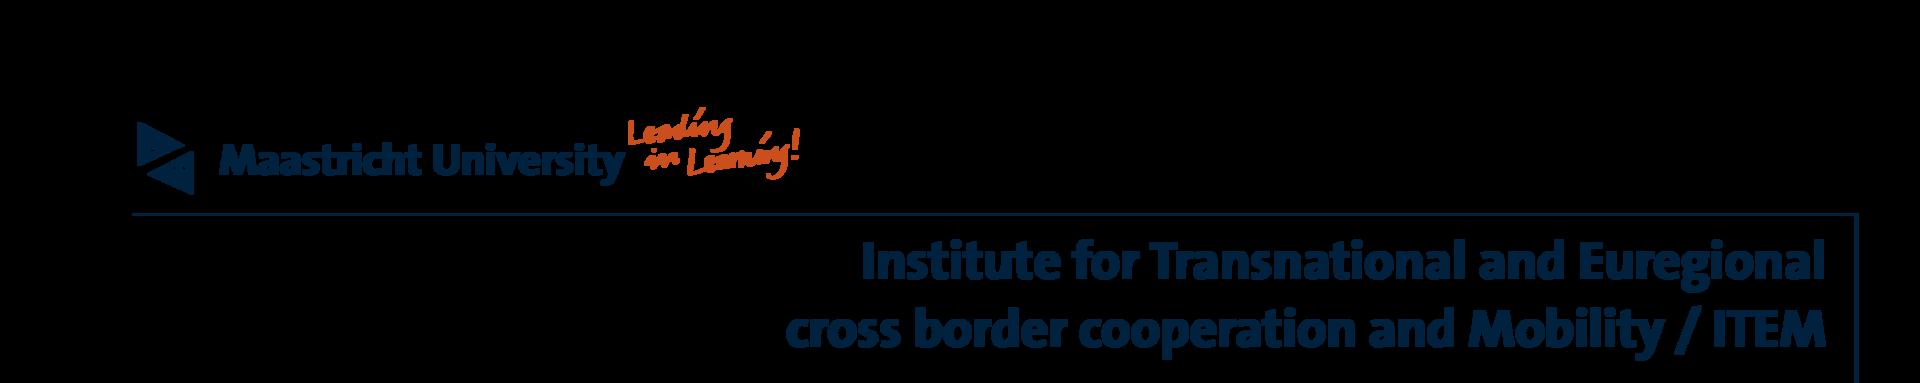 ITEM/Team GWO informatiesessie 'Beperkte/onbeperkte Duitse belastingplicht